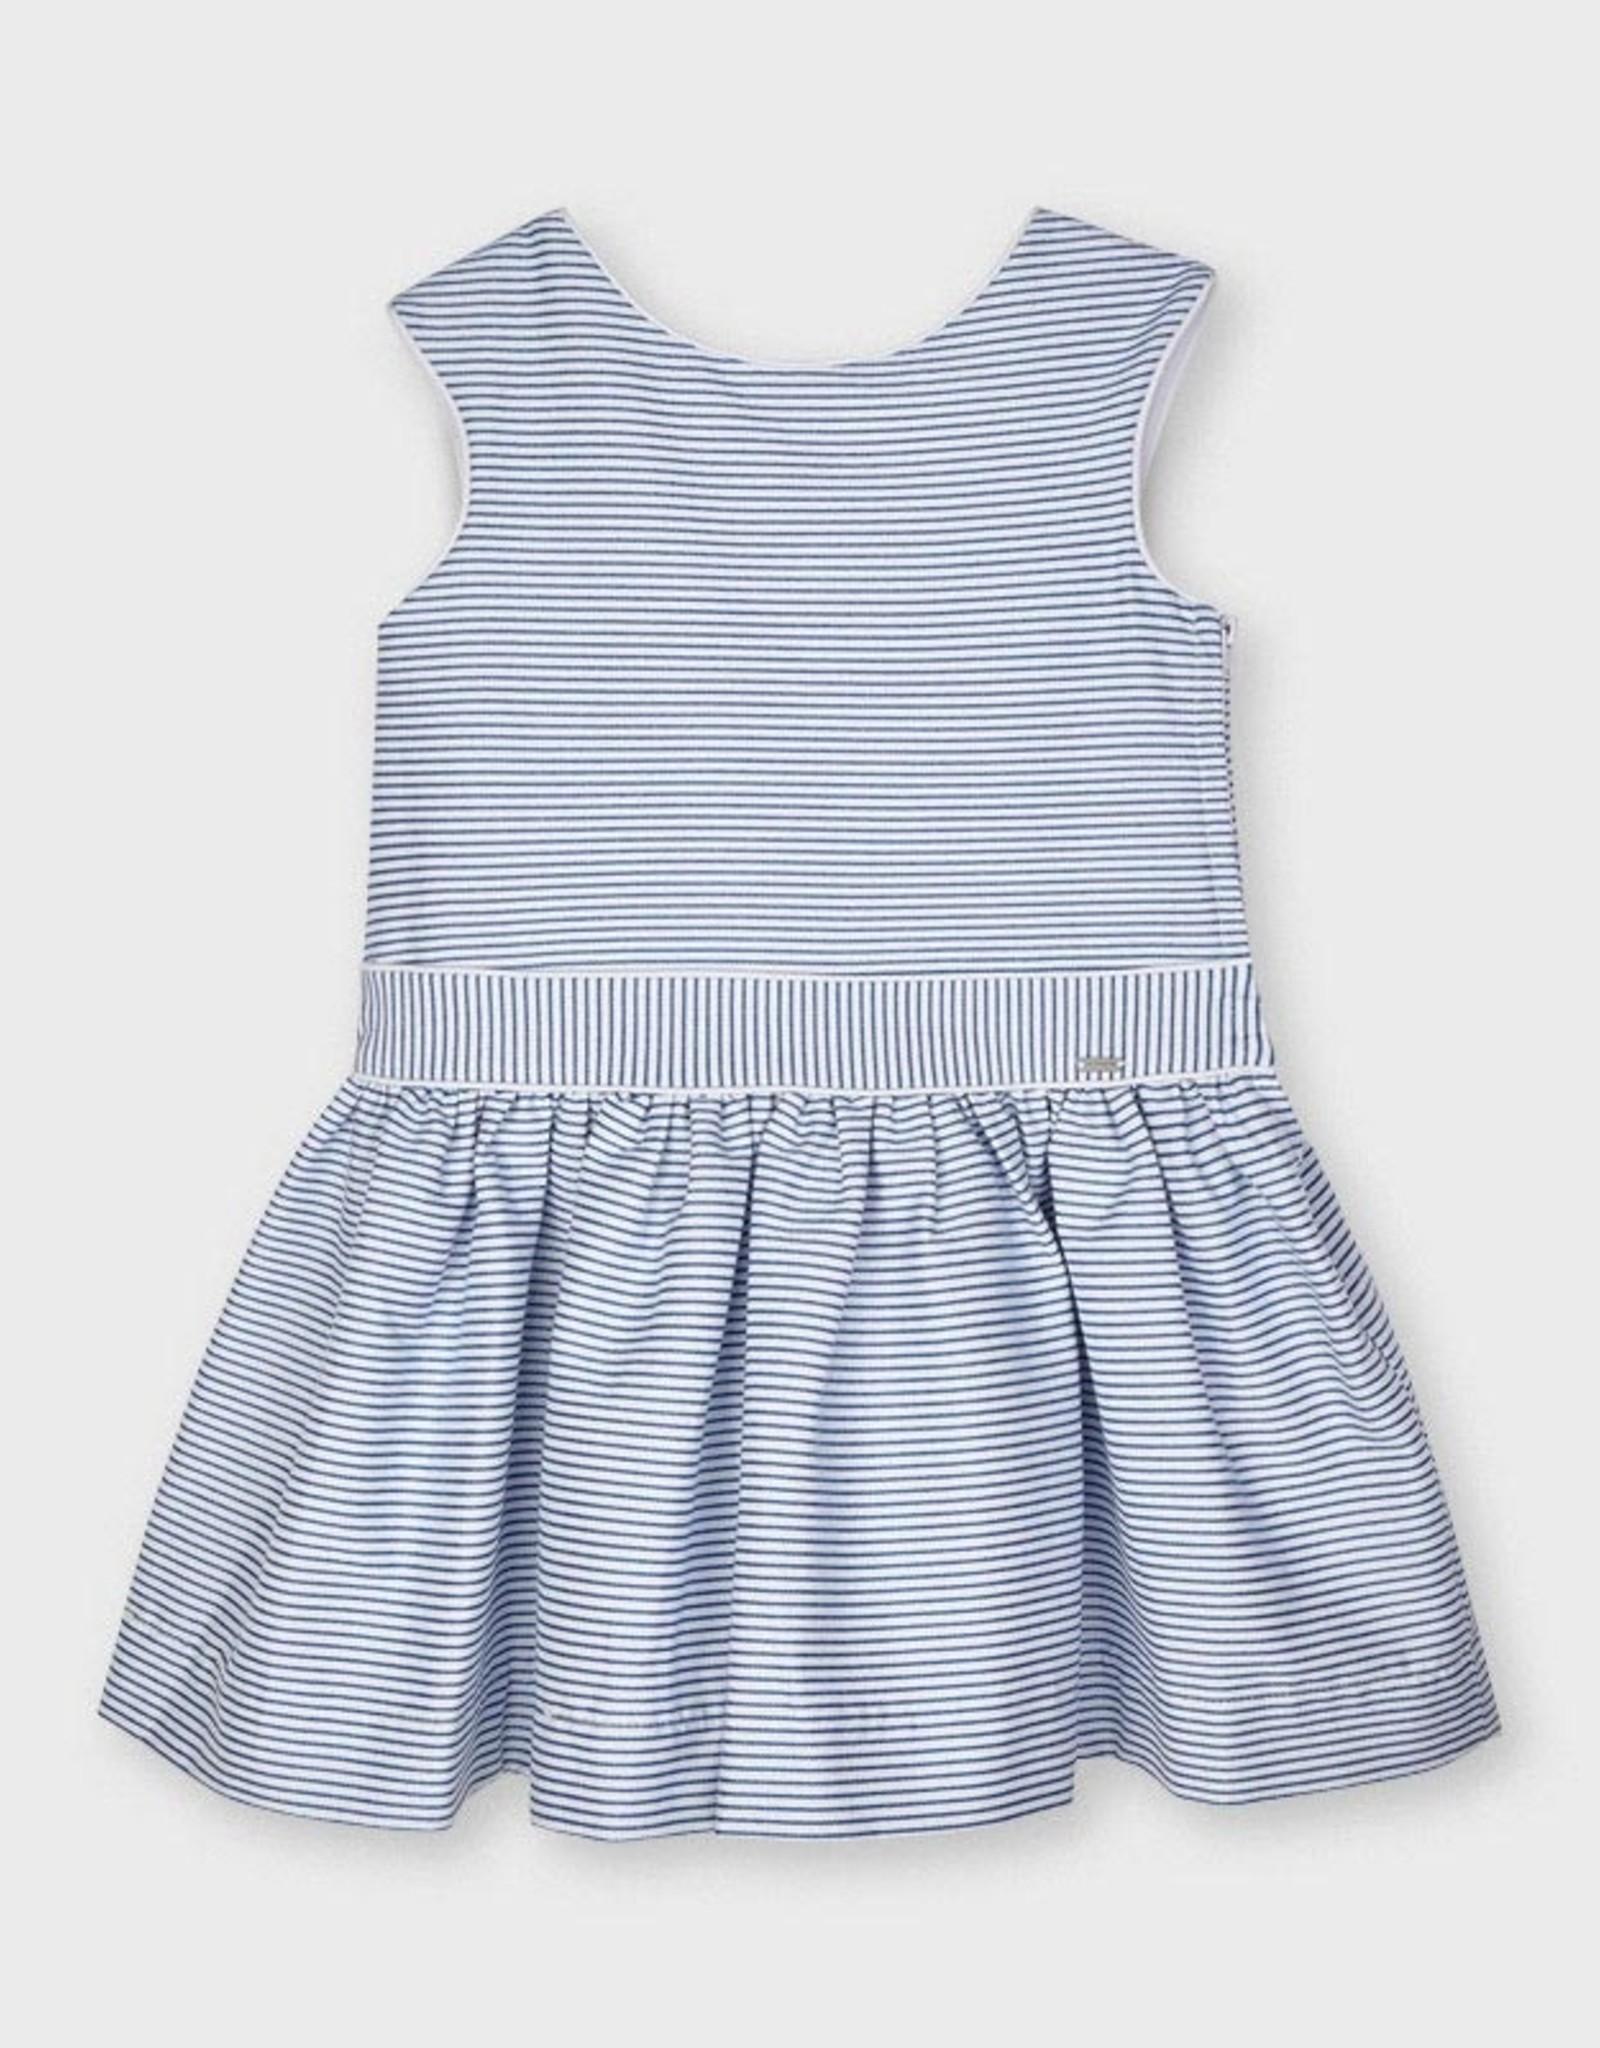 Mayoral SP21 G Blue Striped Dress